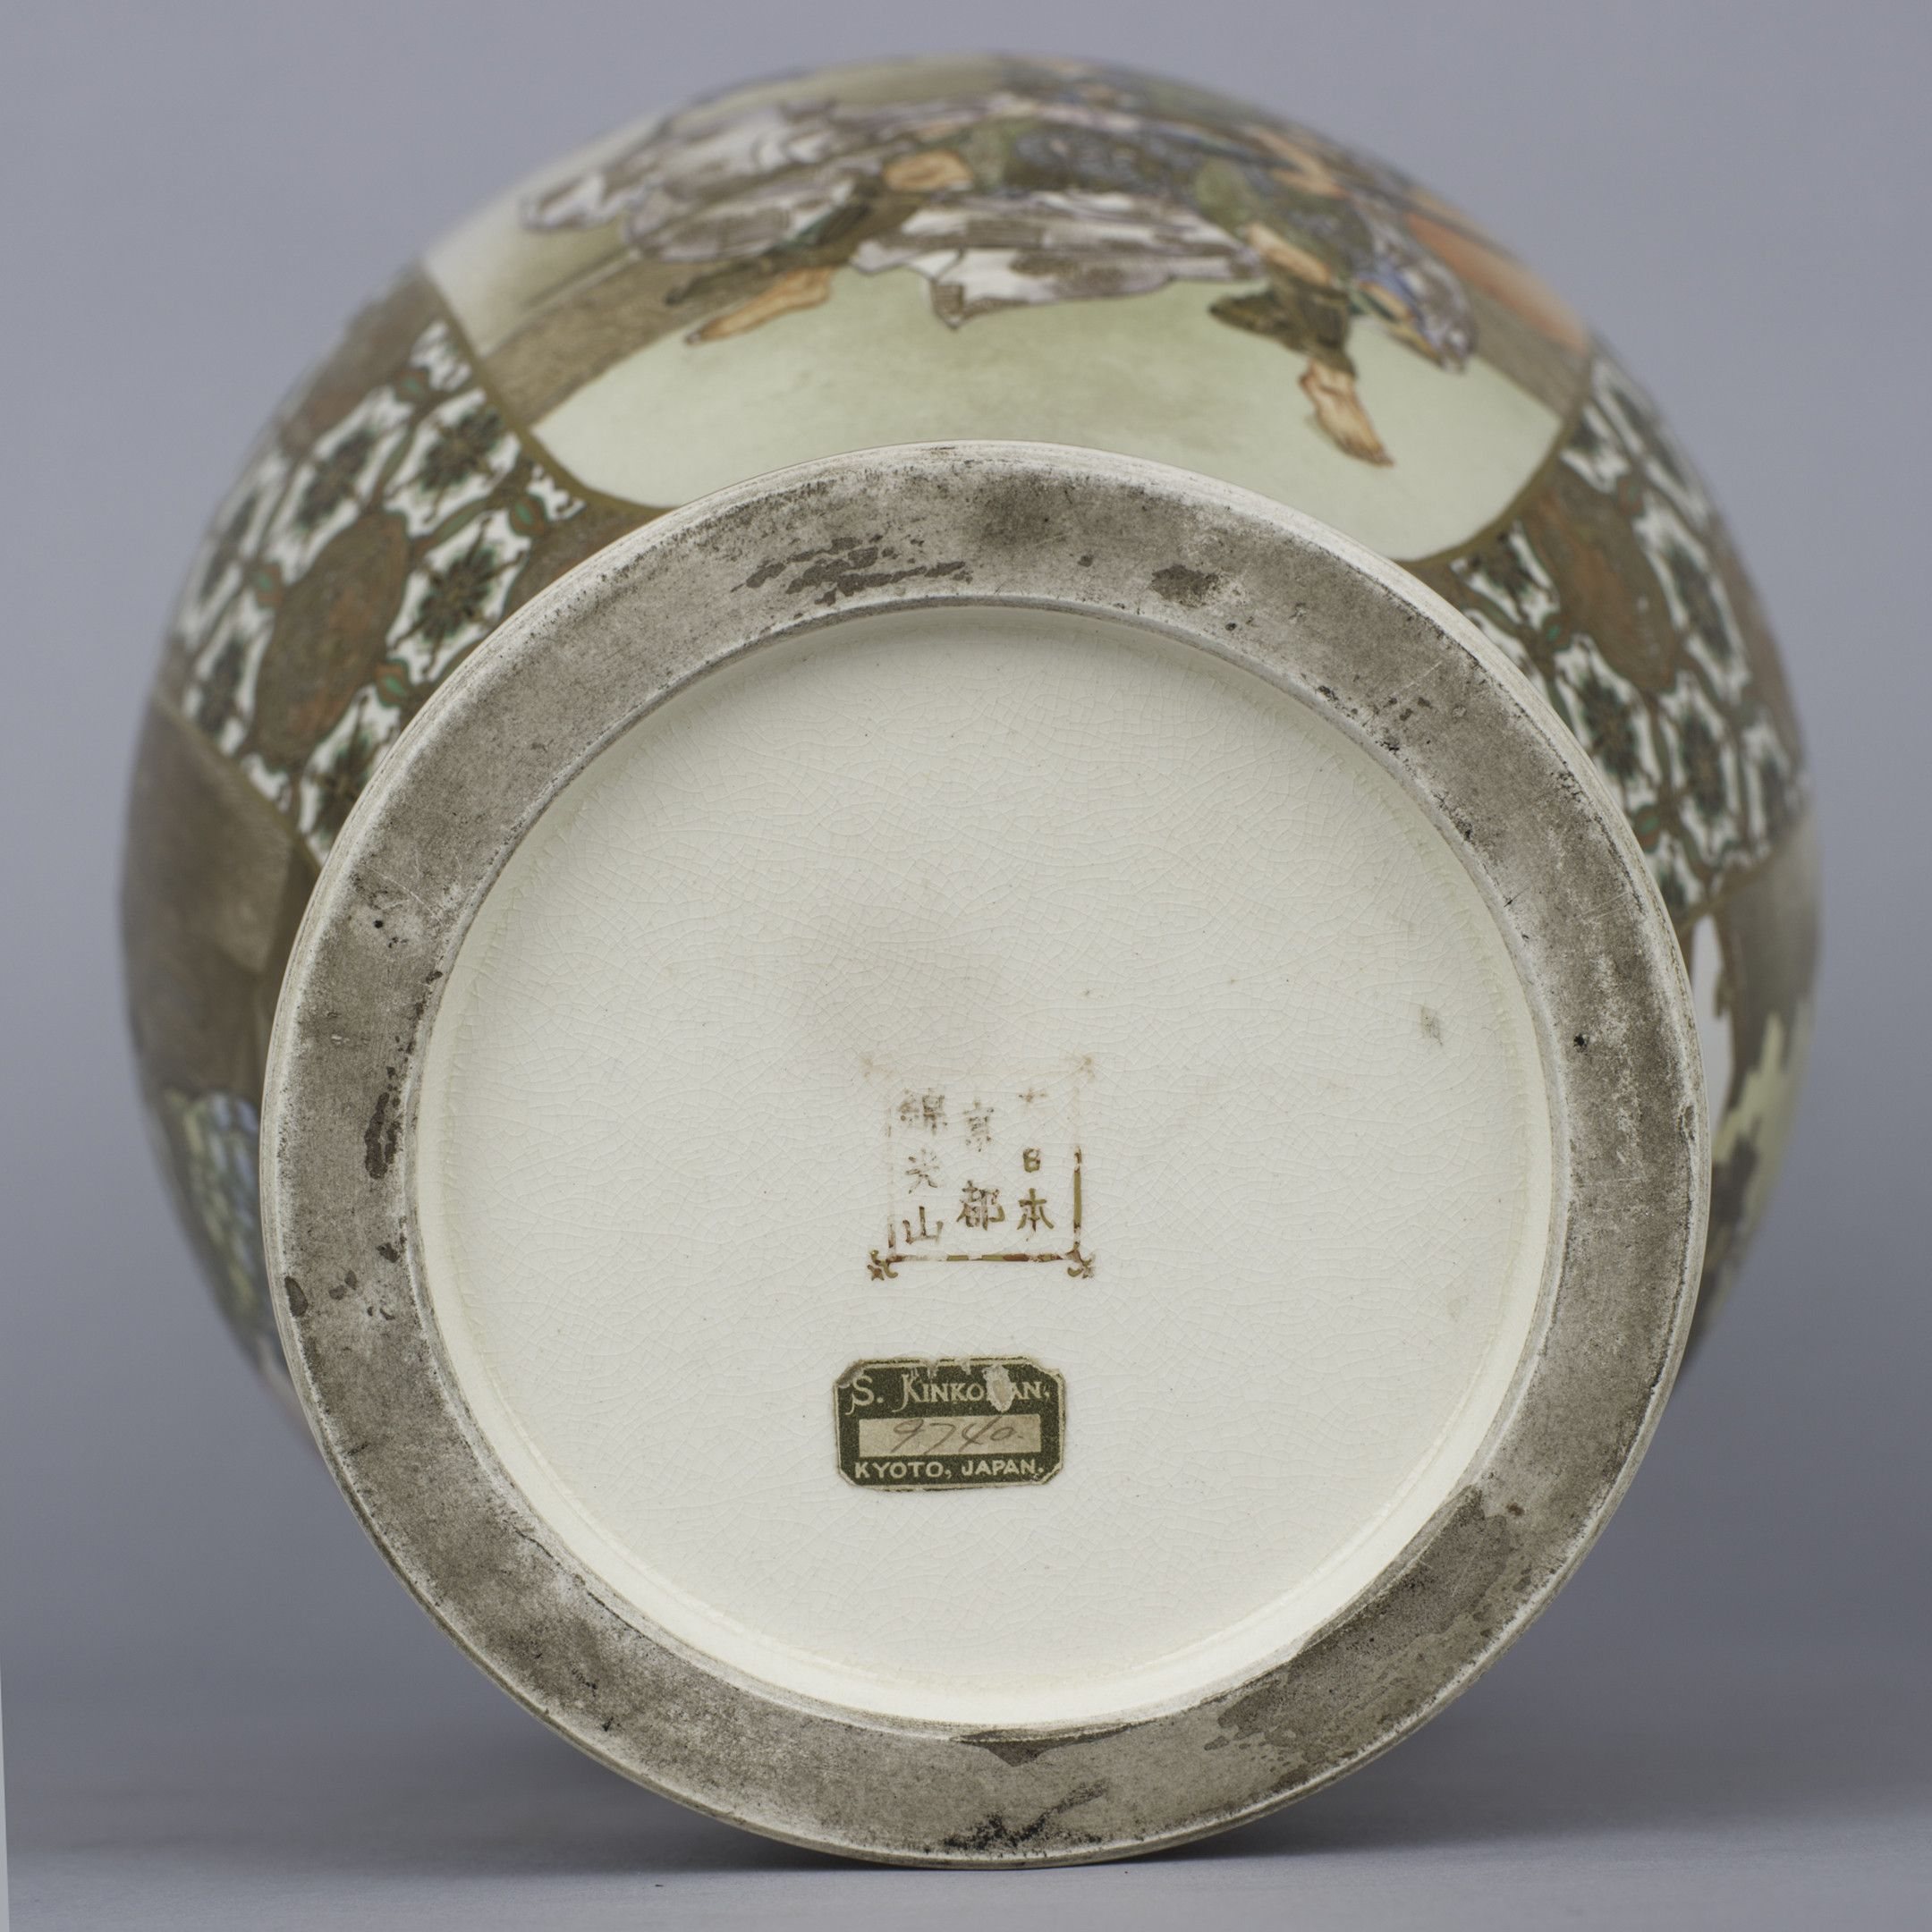 Satsuma vase meiji period 1868 1912 signed kinkozan porcelana satsuma vase meiji period 1868 1912 signed kinkozan reviewsmspy